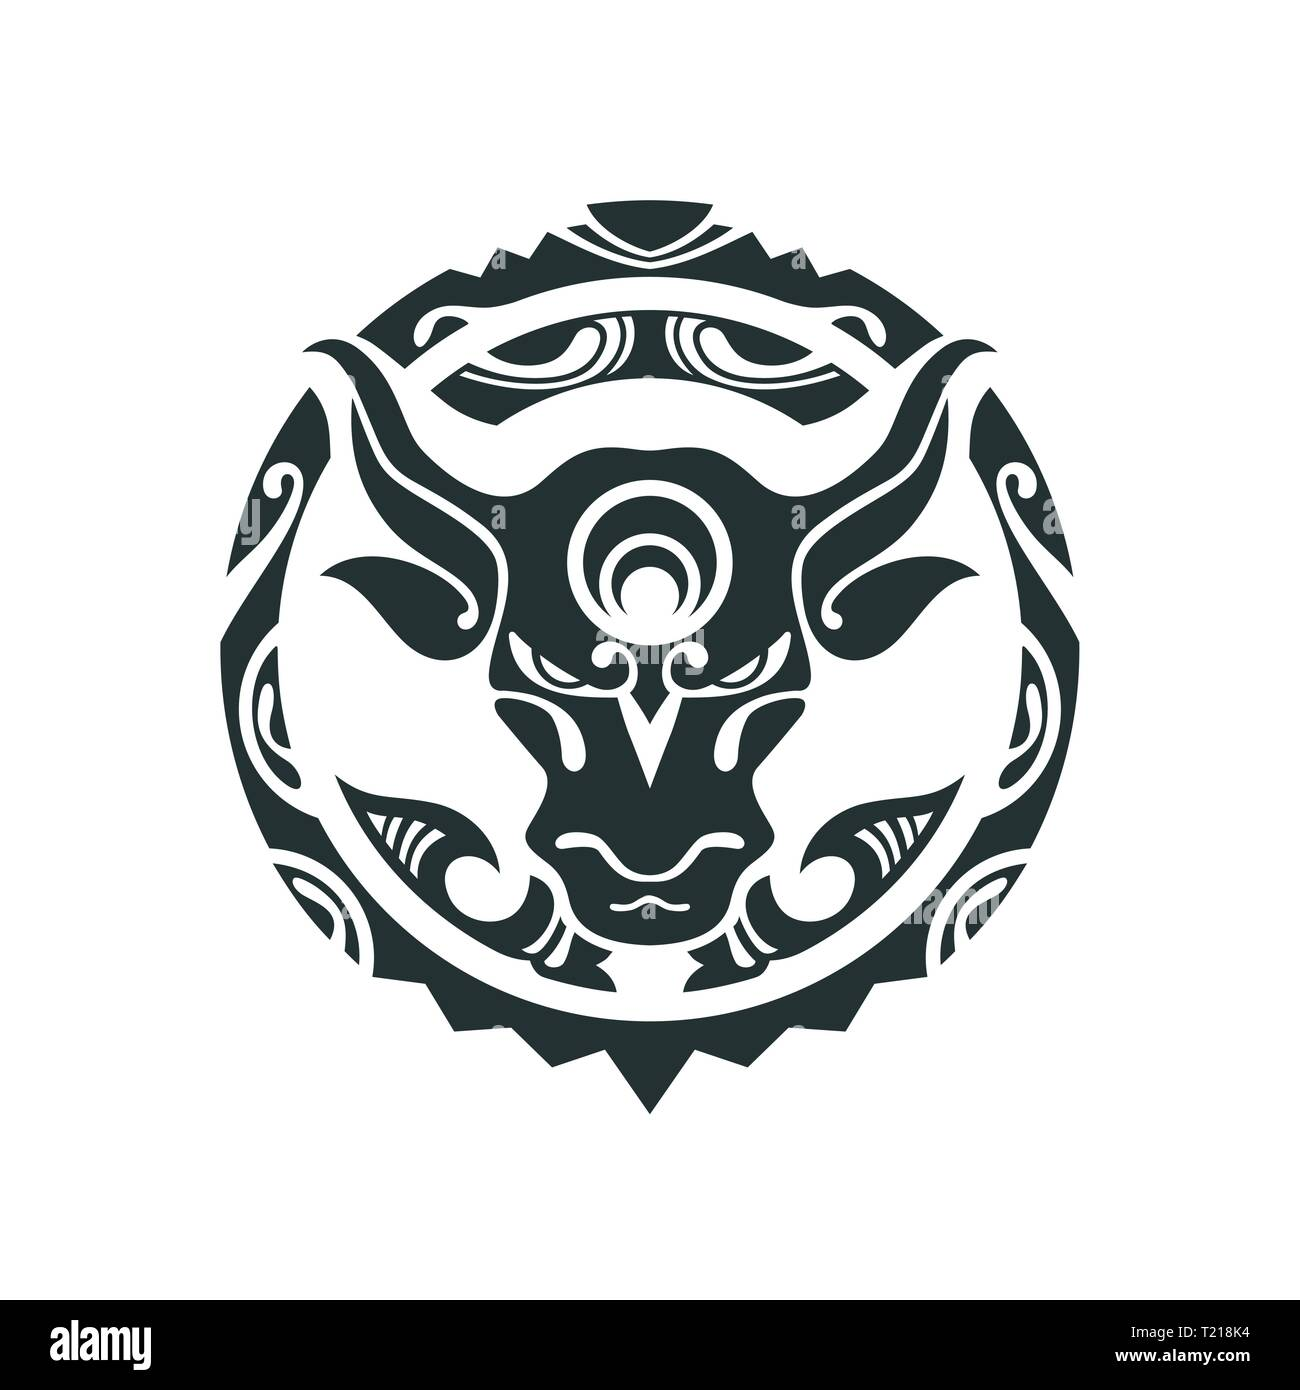 Tattoo of a bull in Polynesian style. Vector illustration. Traditional Maori Taniwha tattoo design - Stock Vector